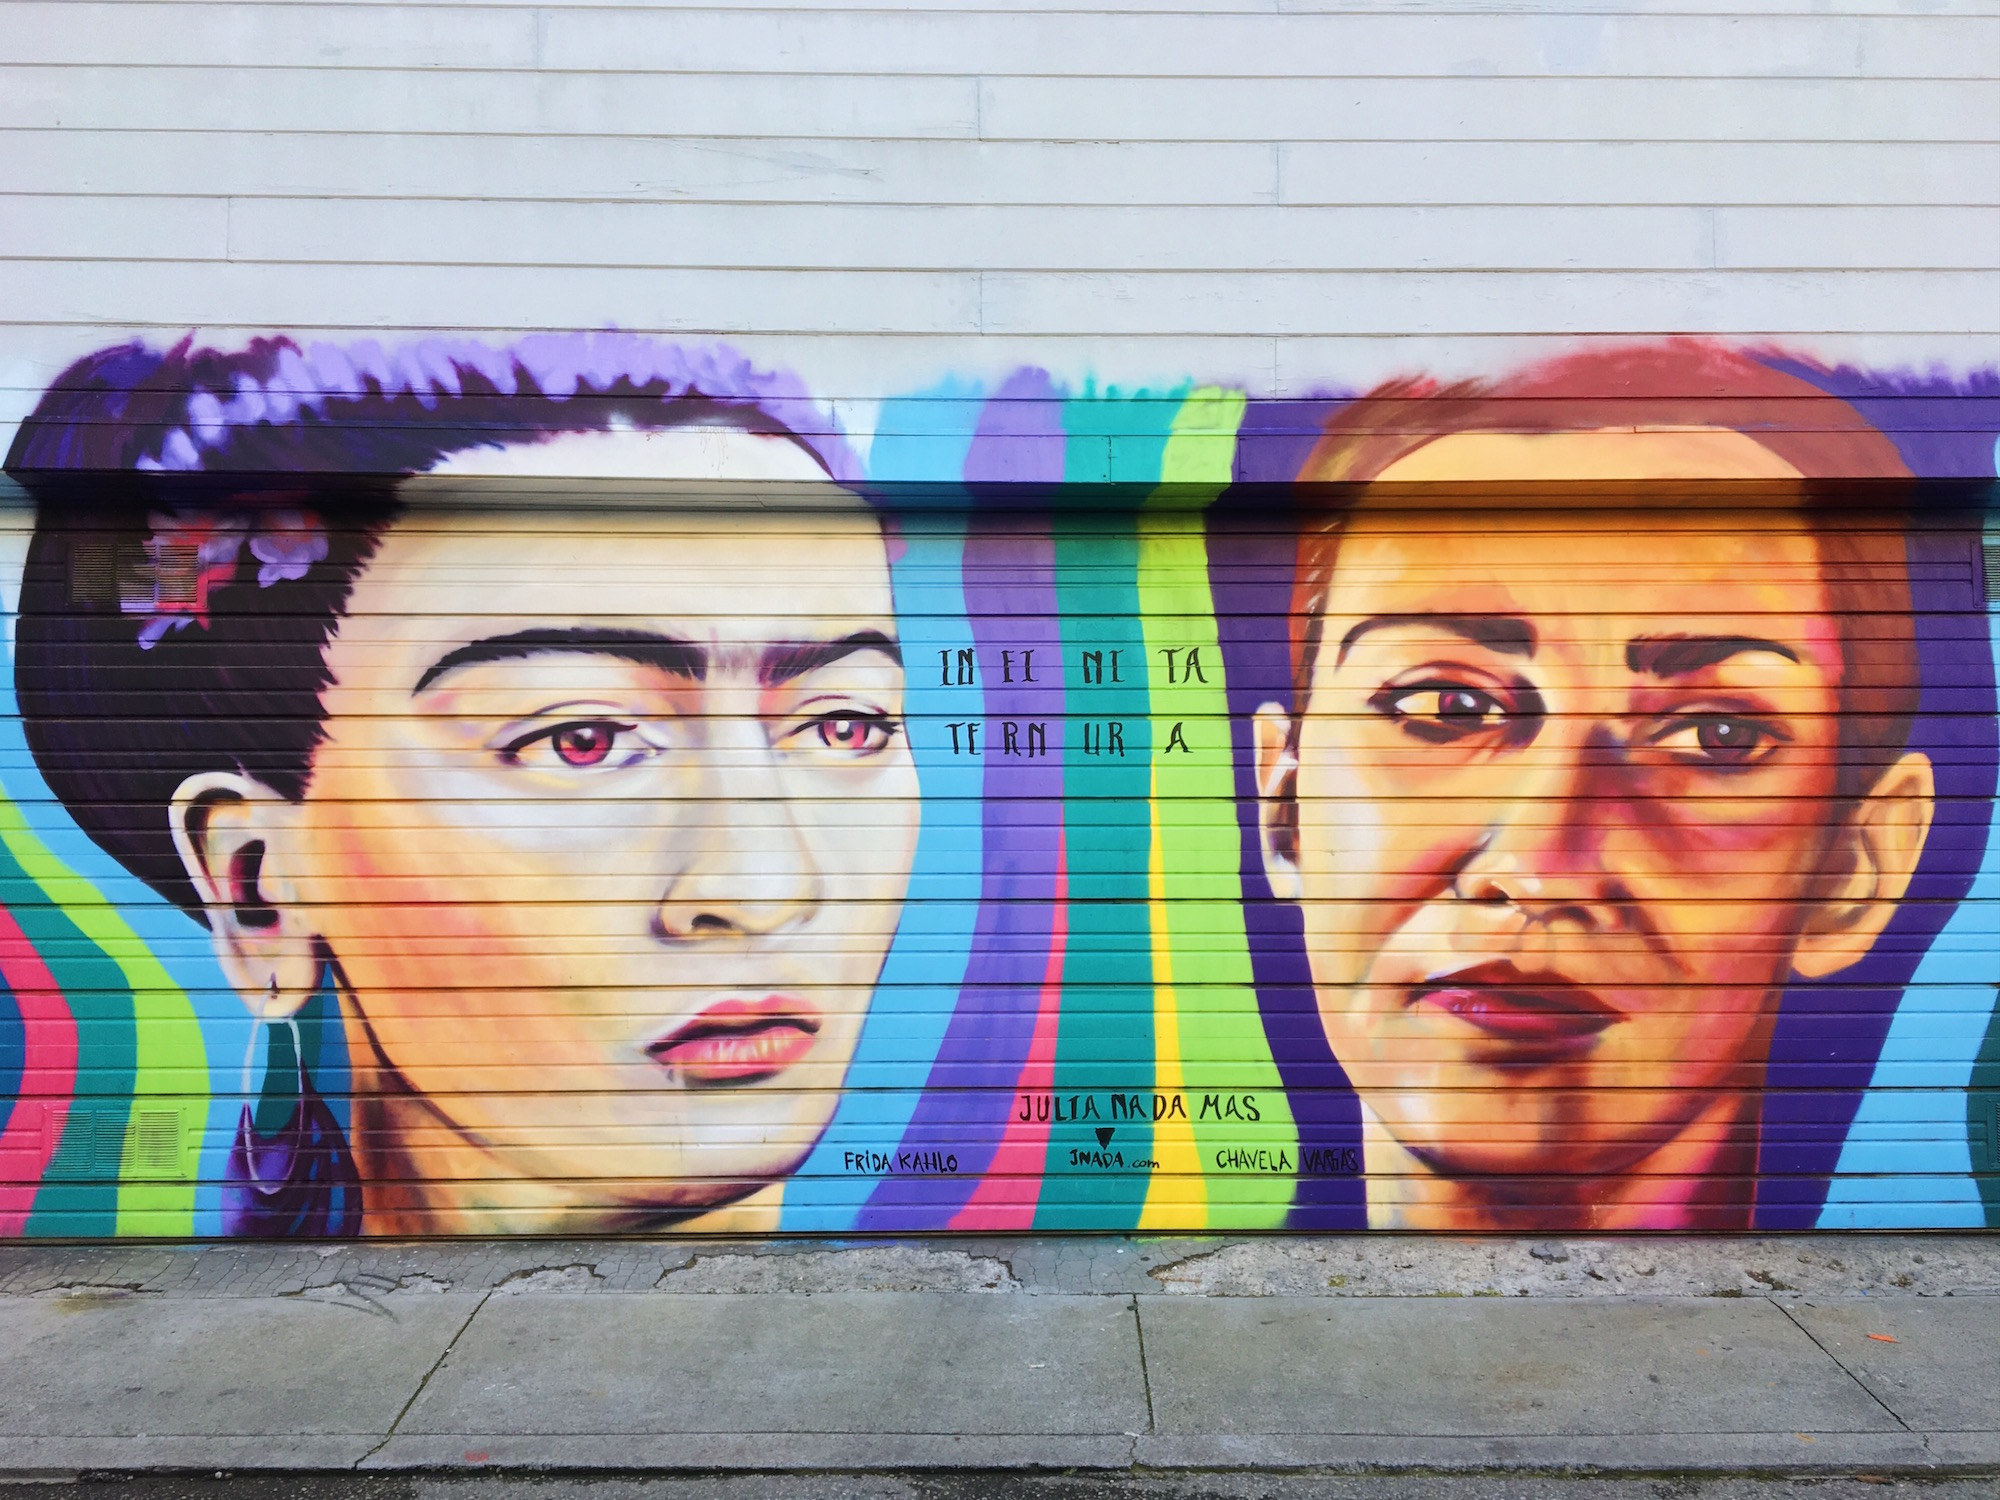 I murales di Mission a San Francisco - Infinita Ternura (2014) - Artist, Julia Nada - Location, Lucky St & 25th St, Mission